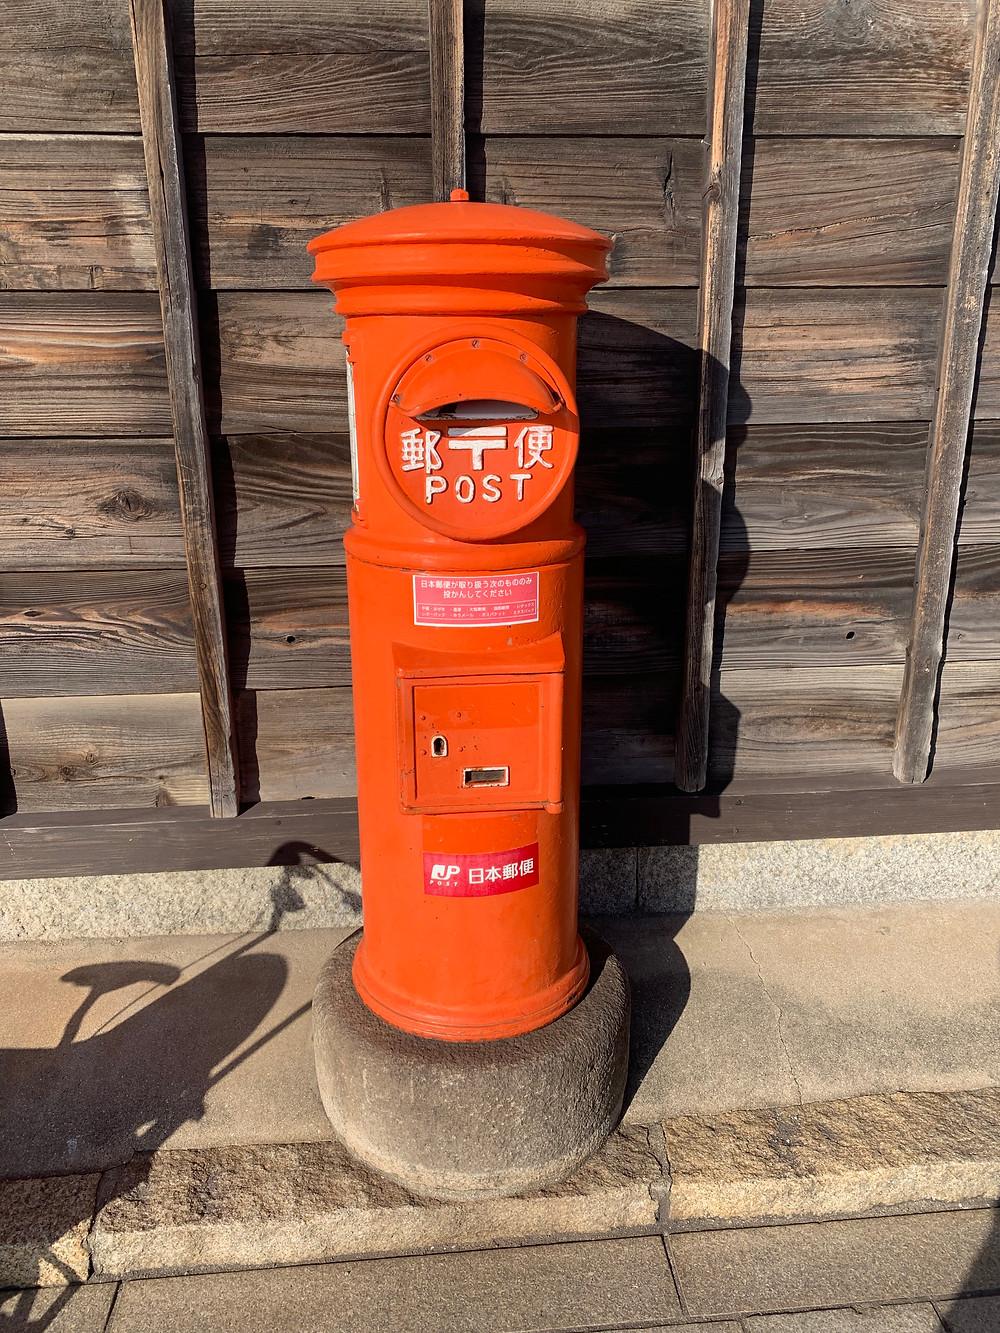 Classical post box